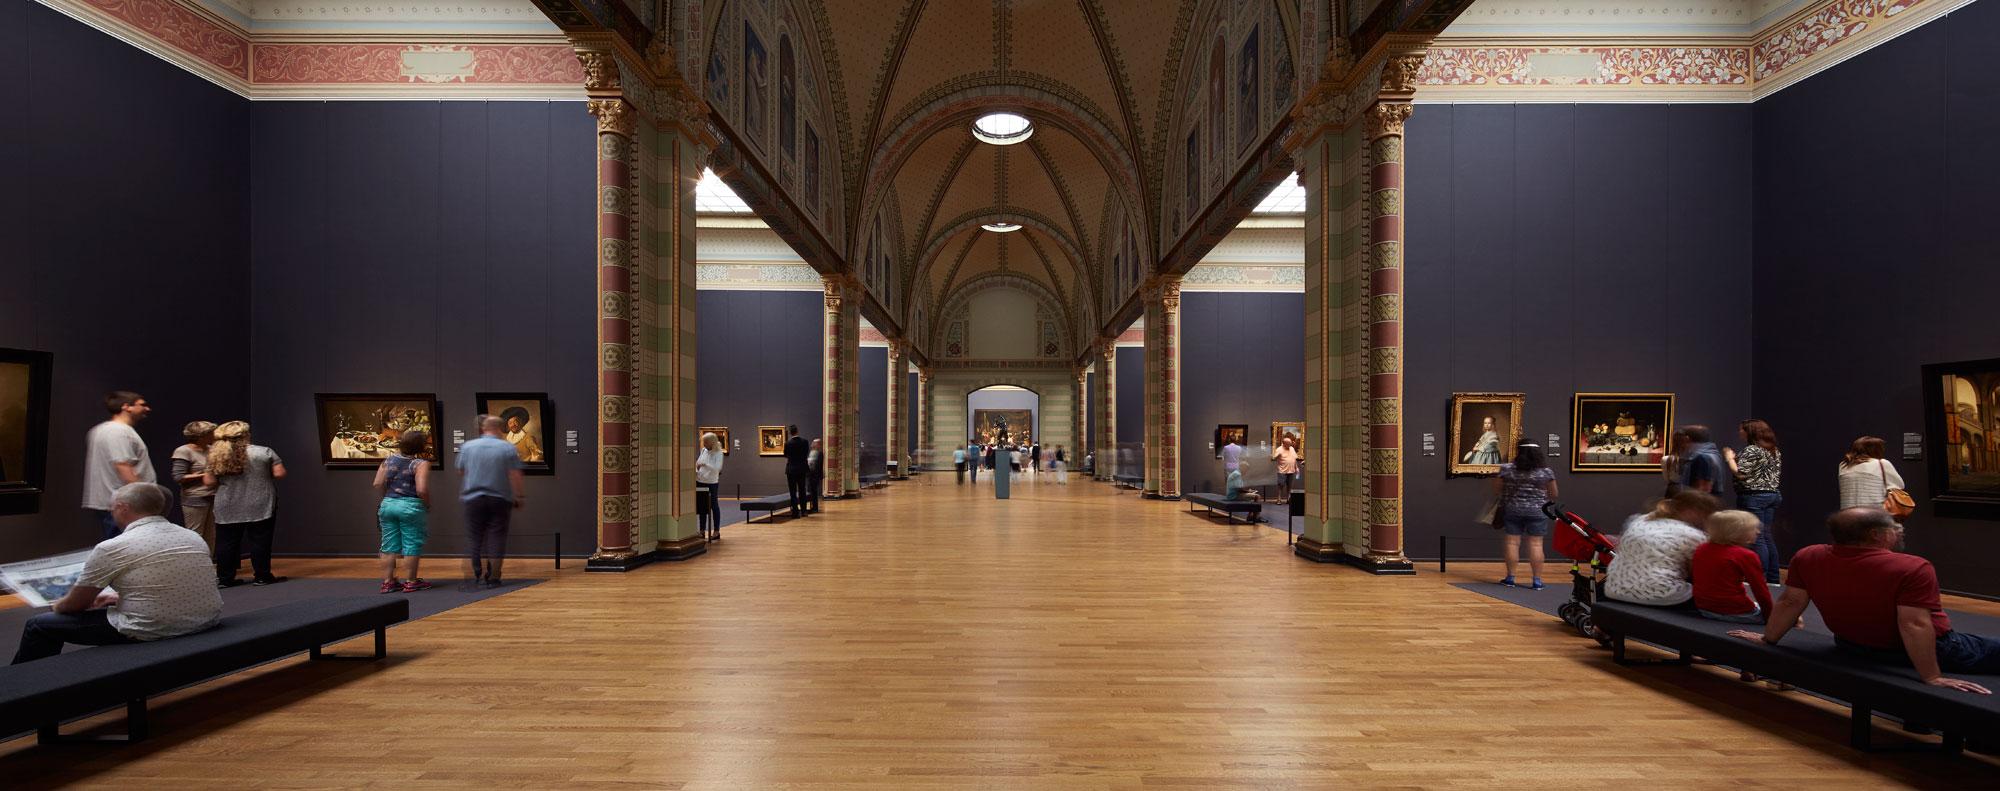 Gallery of Honour. Photo: Erik Smits